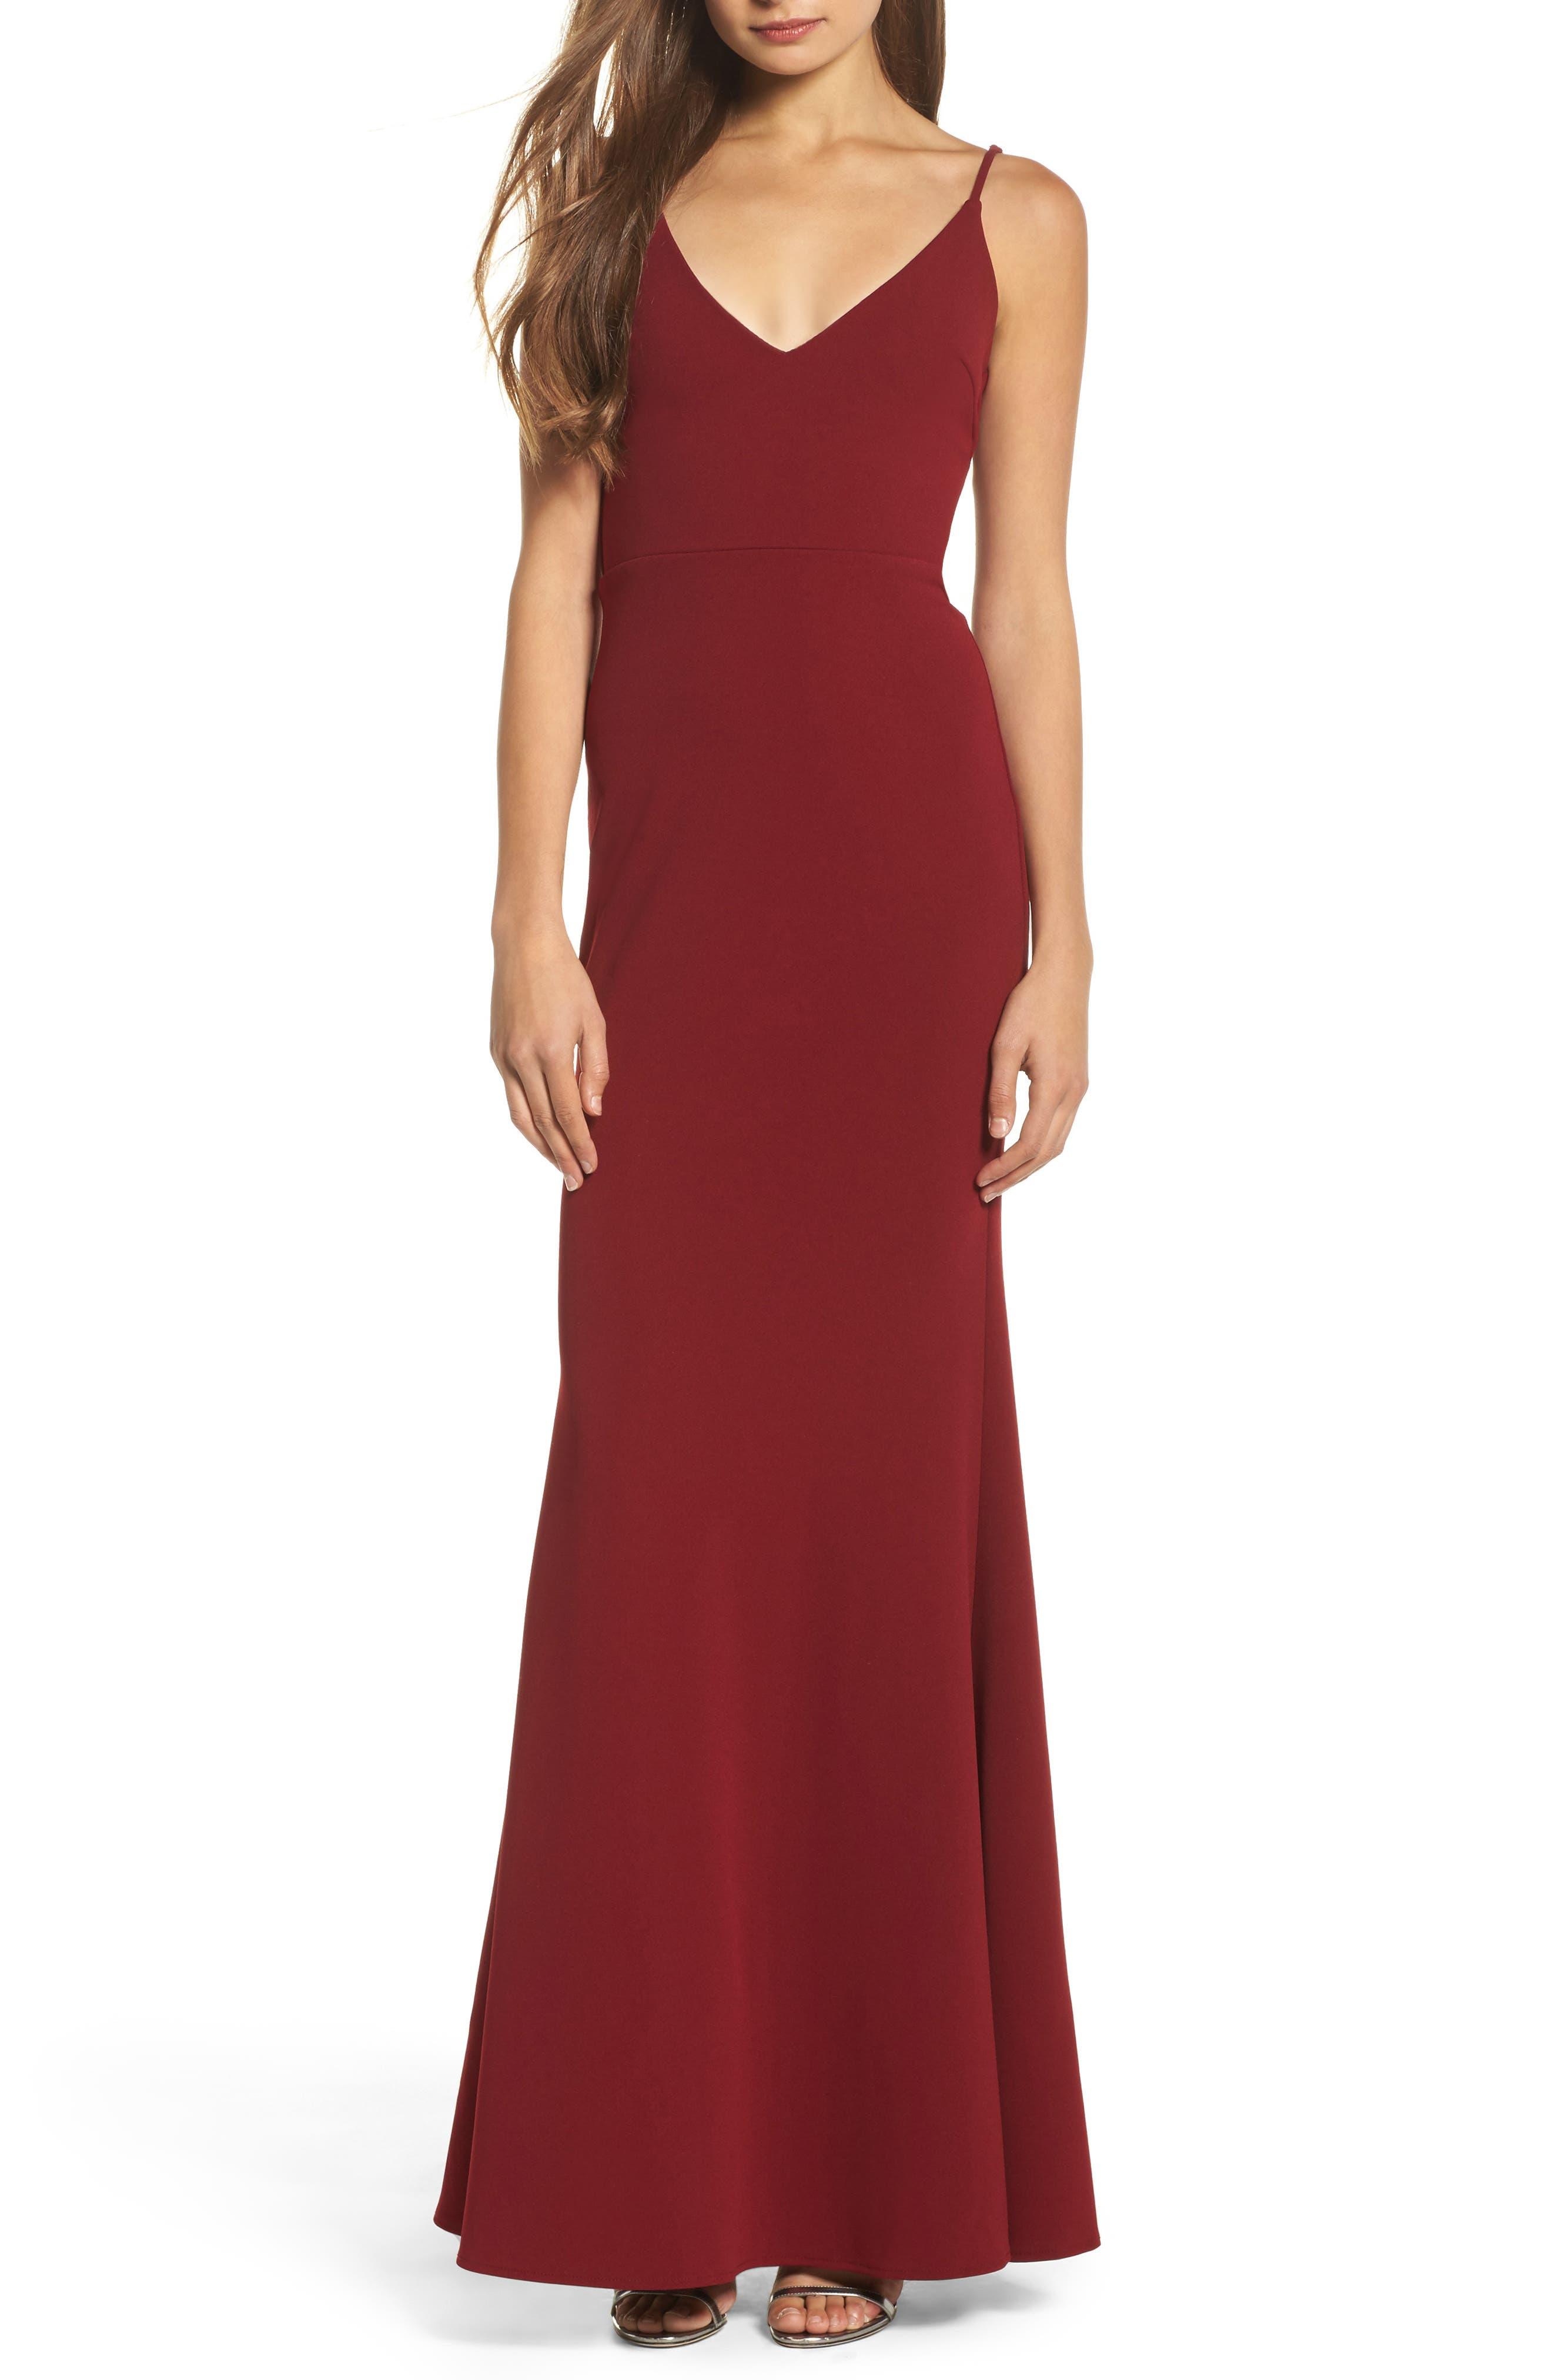 Burgundy's Trumpet Dress